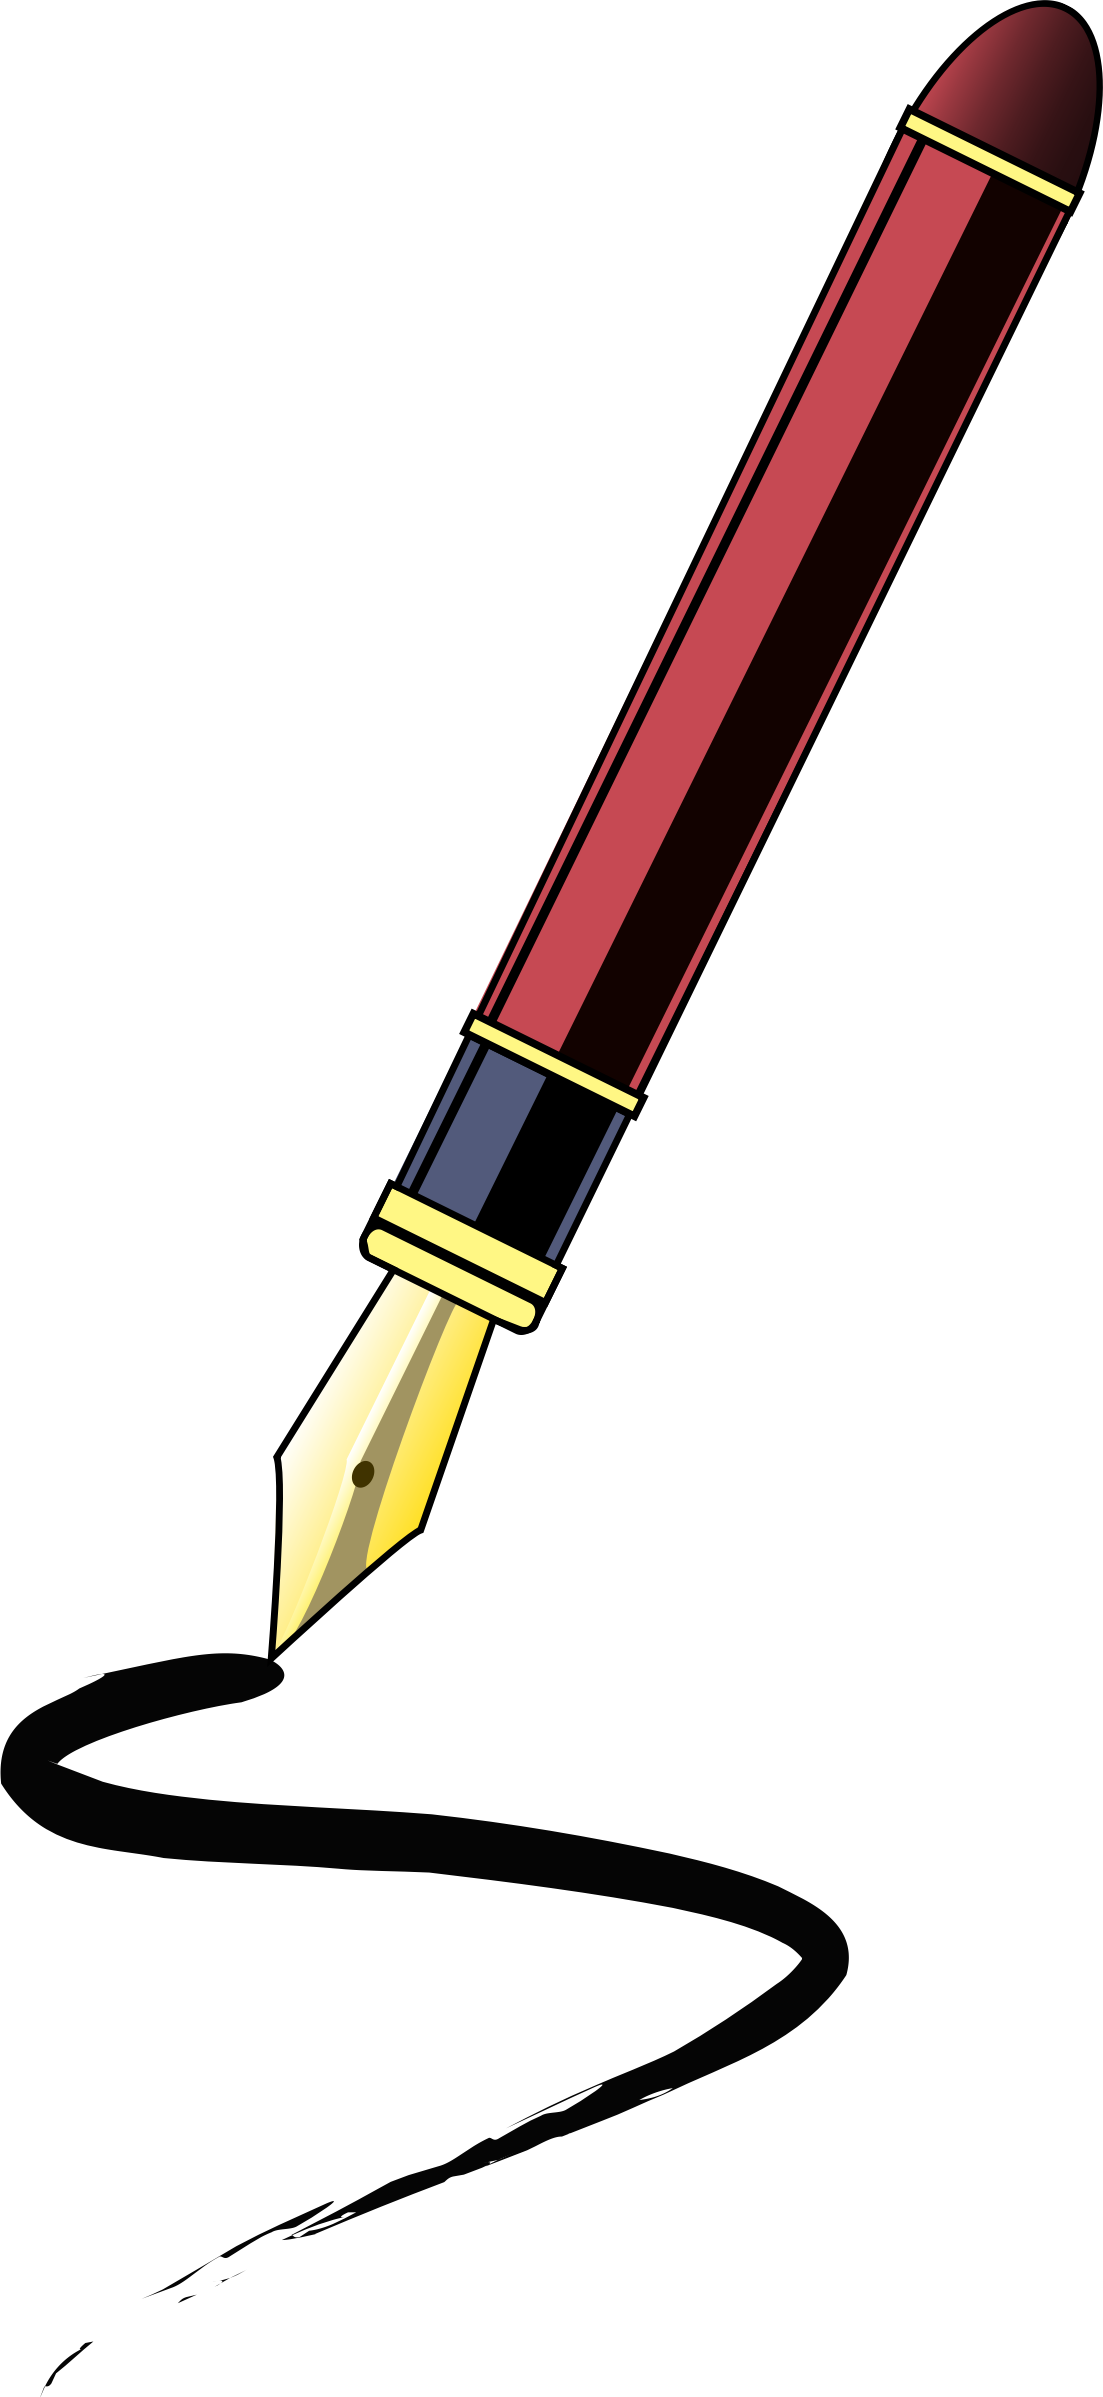 Pen clipart journalist BIG (PNG) Stylo IMAGE Clipart